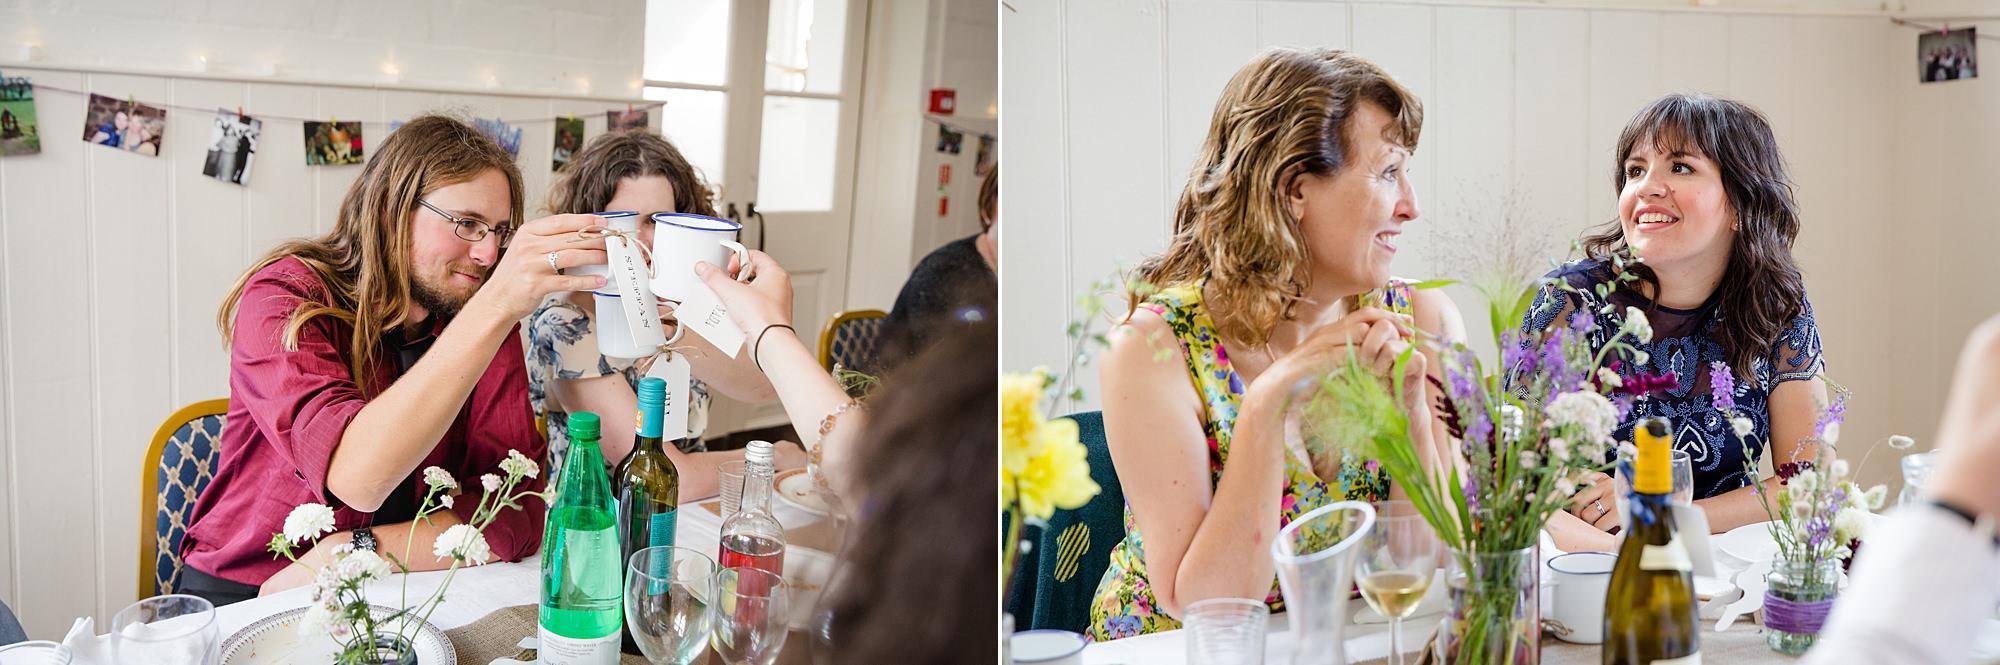 Fun village hall wedding guests make a toast